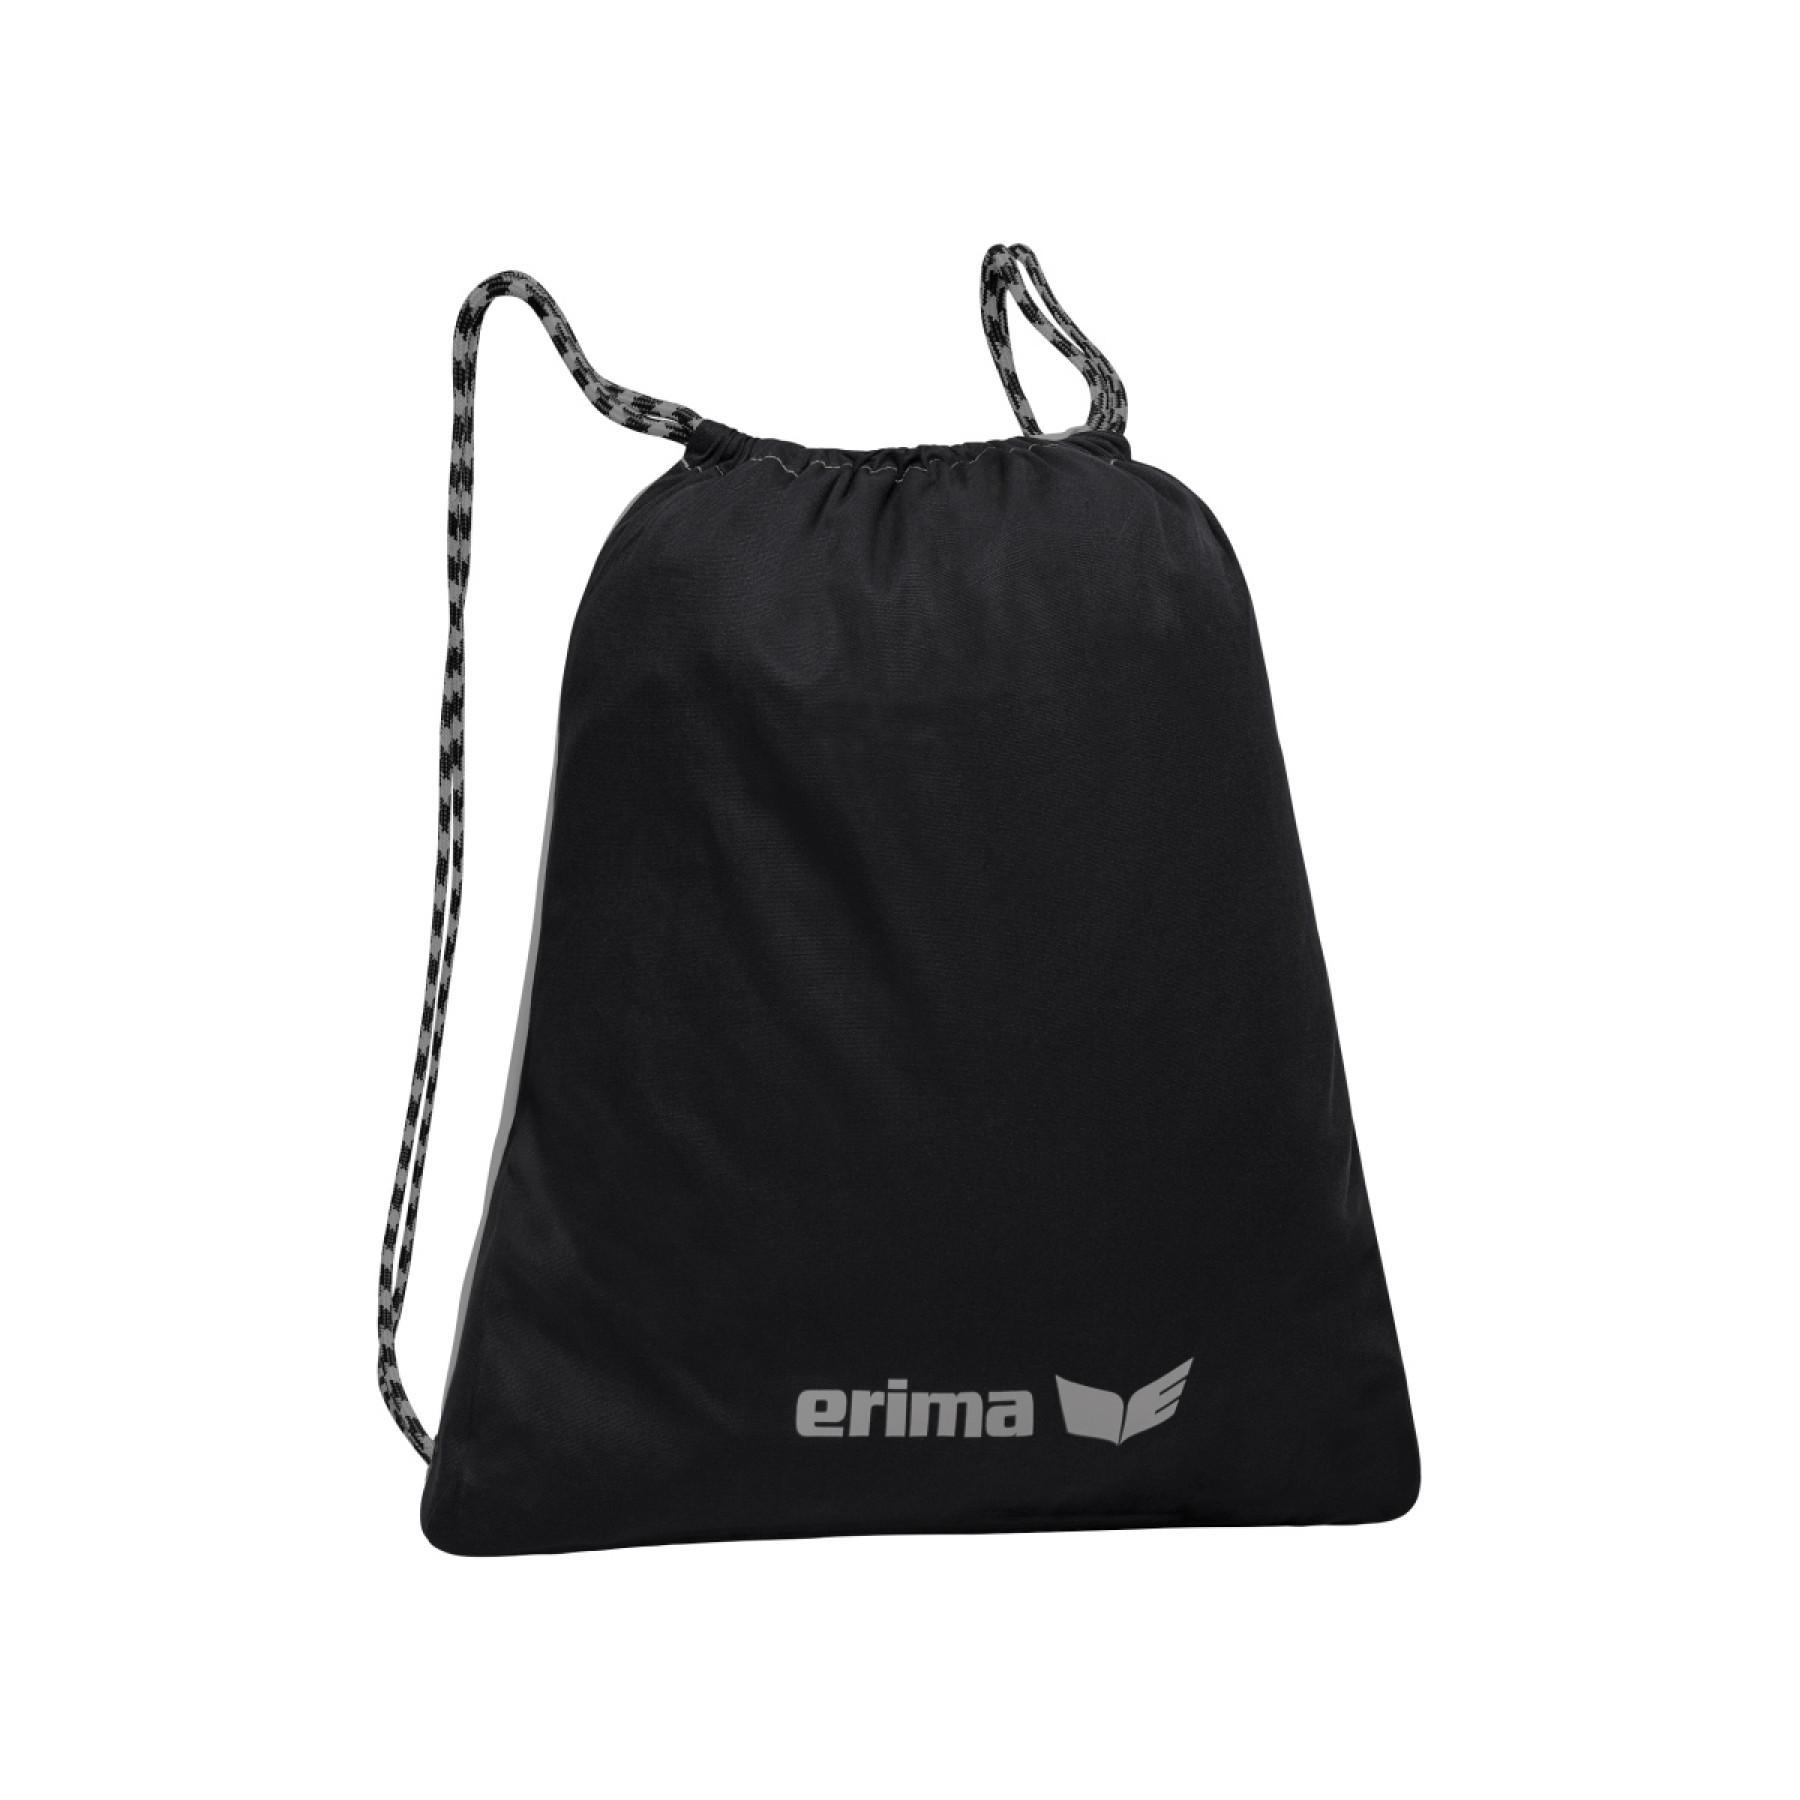 Erima Multifunction Bag